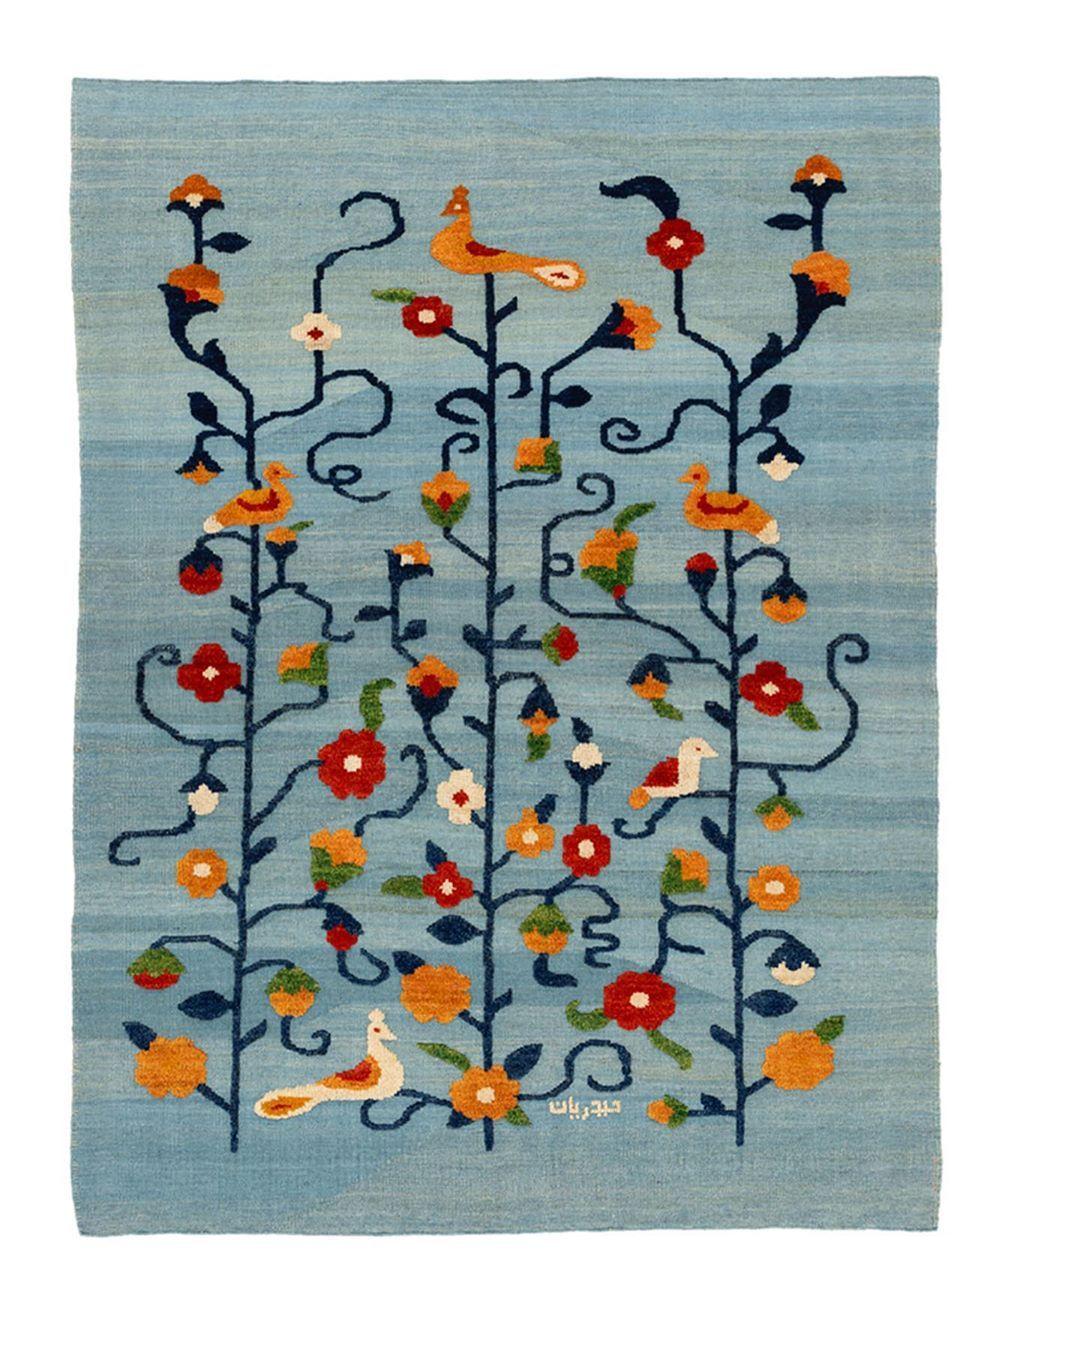 Heidarian فرش دستبافت On Instagram فرش حیدریان برای رفاه حال شما دوست داران فرش بیش از پیش آماده خدمت رسانی به صورت آنلاین از طریق وب Kids Rugs Rugs Decor